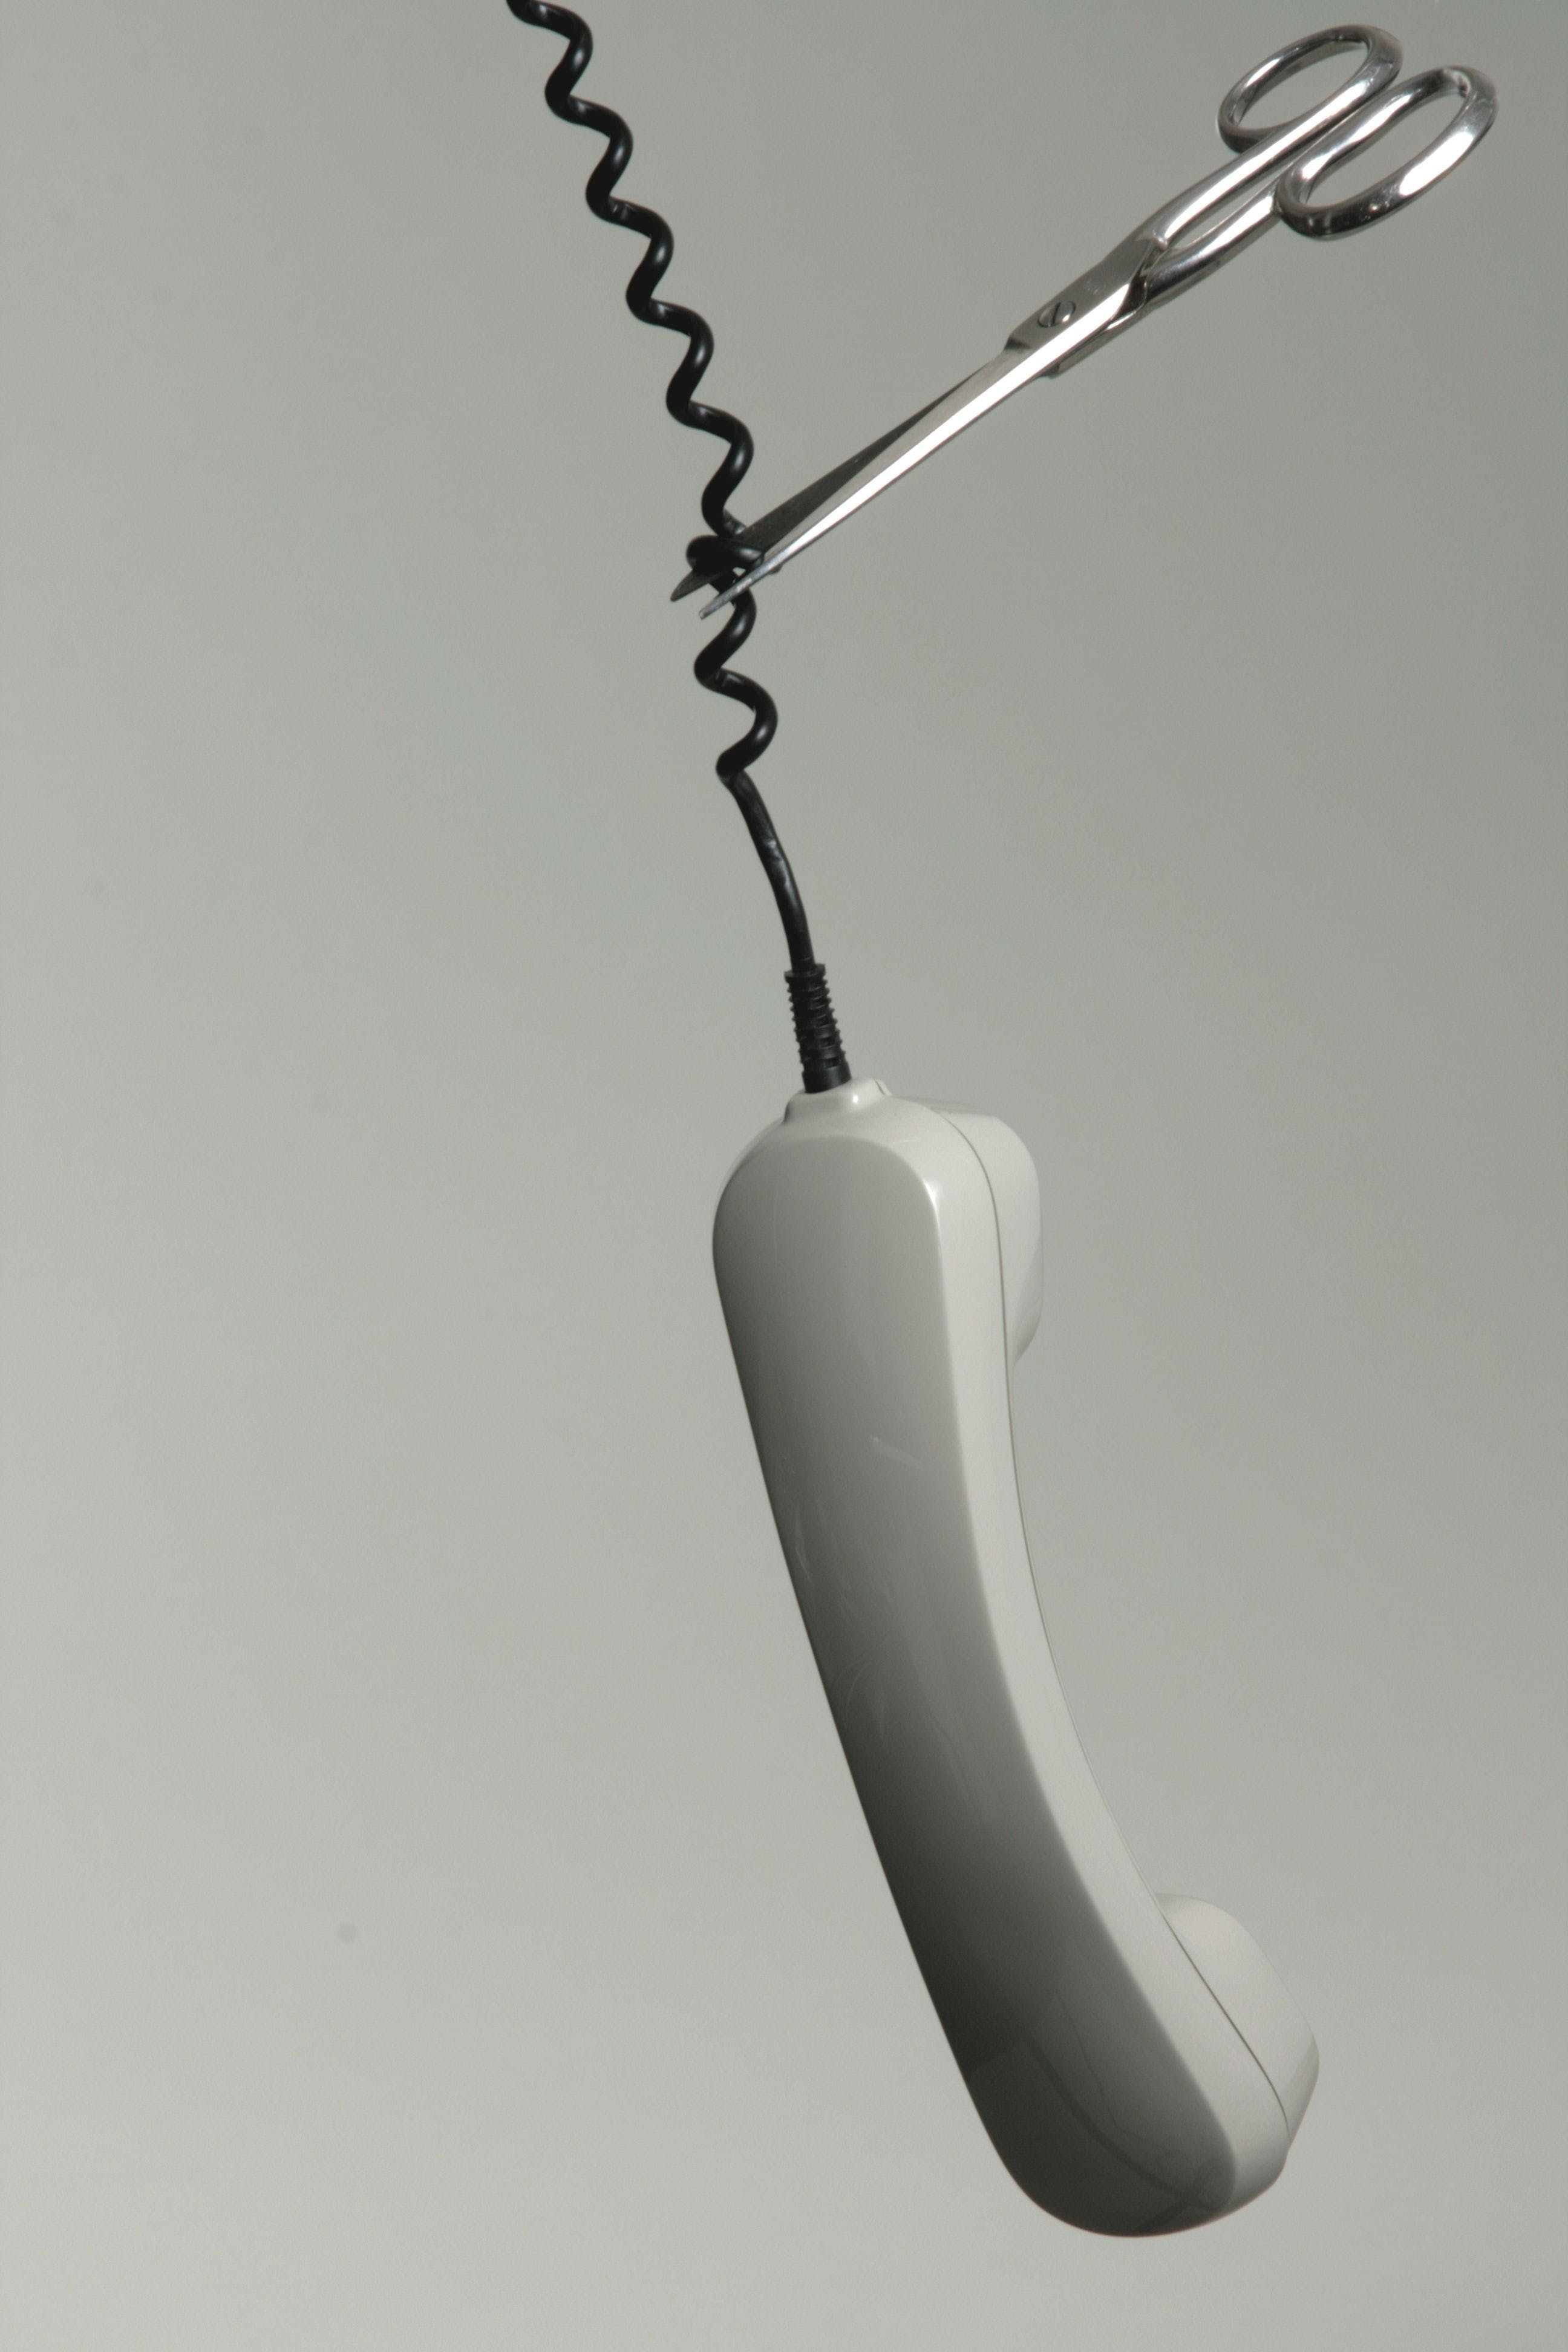 Scissor Cutting Telephone's Trim Line